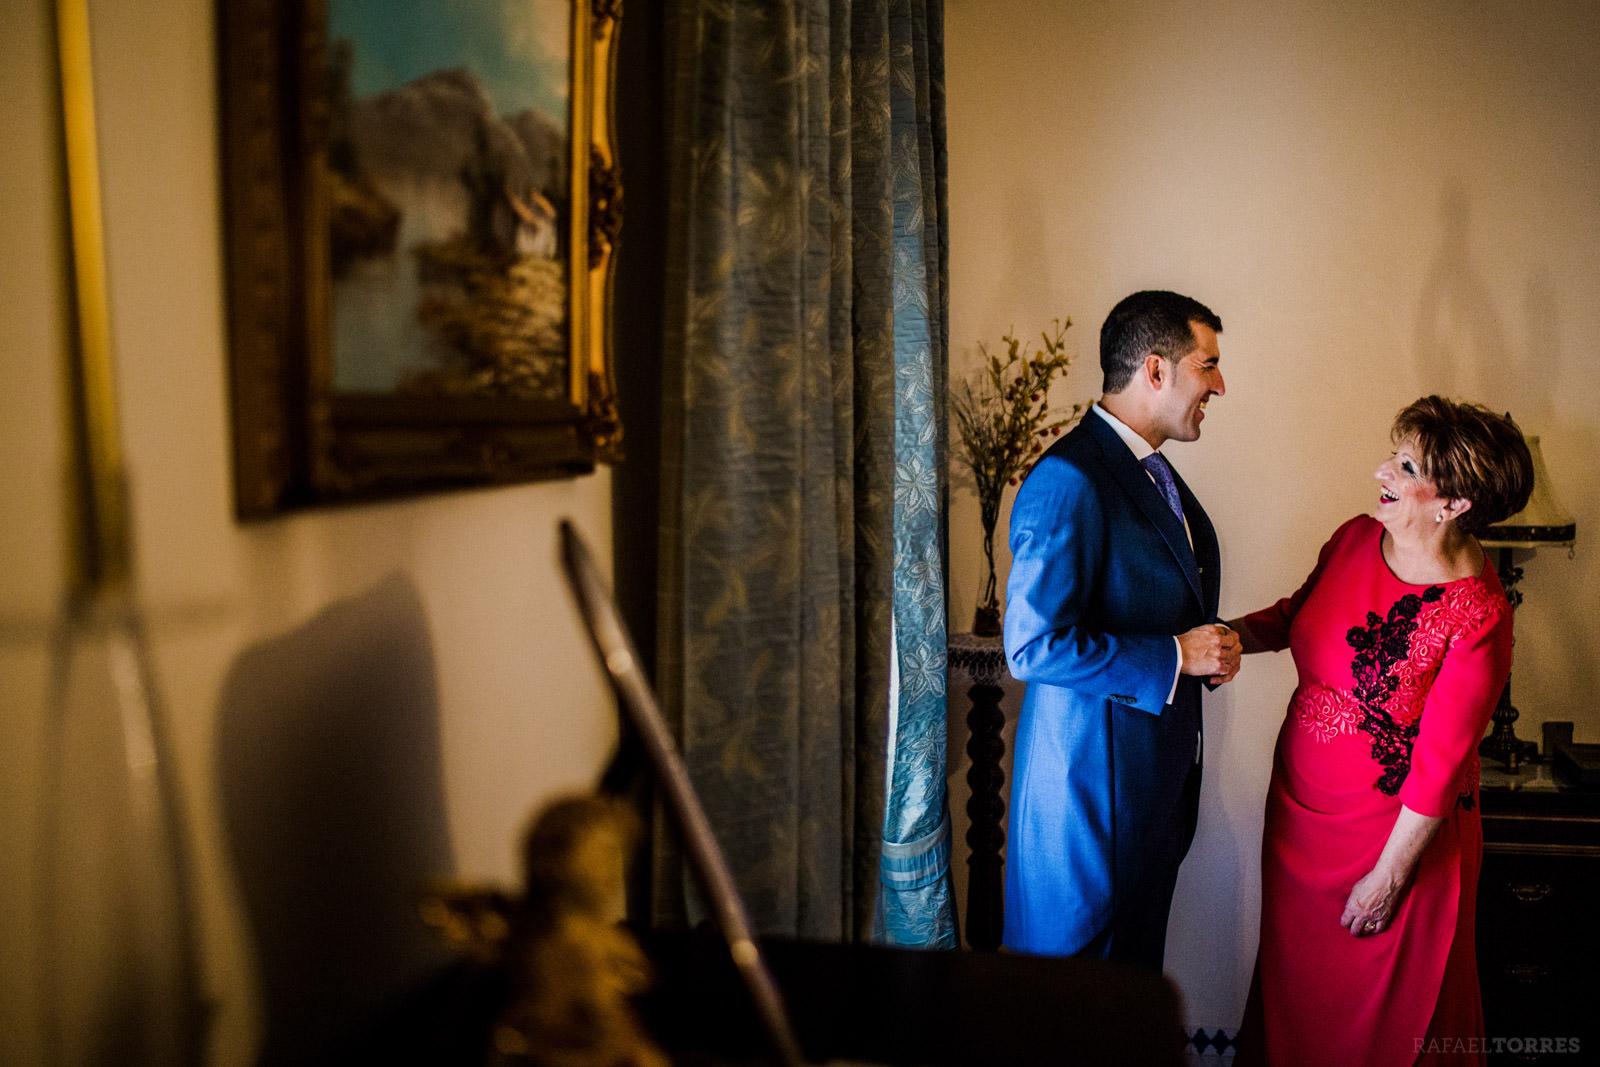 Rafael+Torres+fotografo+bodas+sevilla+madrid+barcelona+wedding+photographer+bodas+diferentes+bodaensevilla+molinillos+fotografo+hacienda+oran+alfonso+wedding+photographer-8.jpg